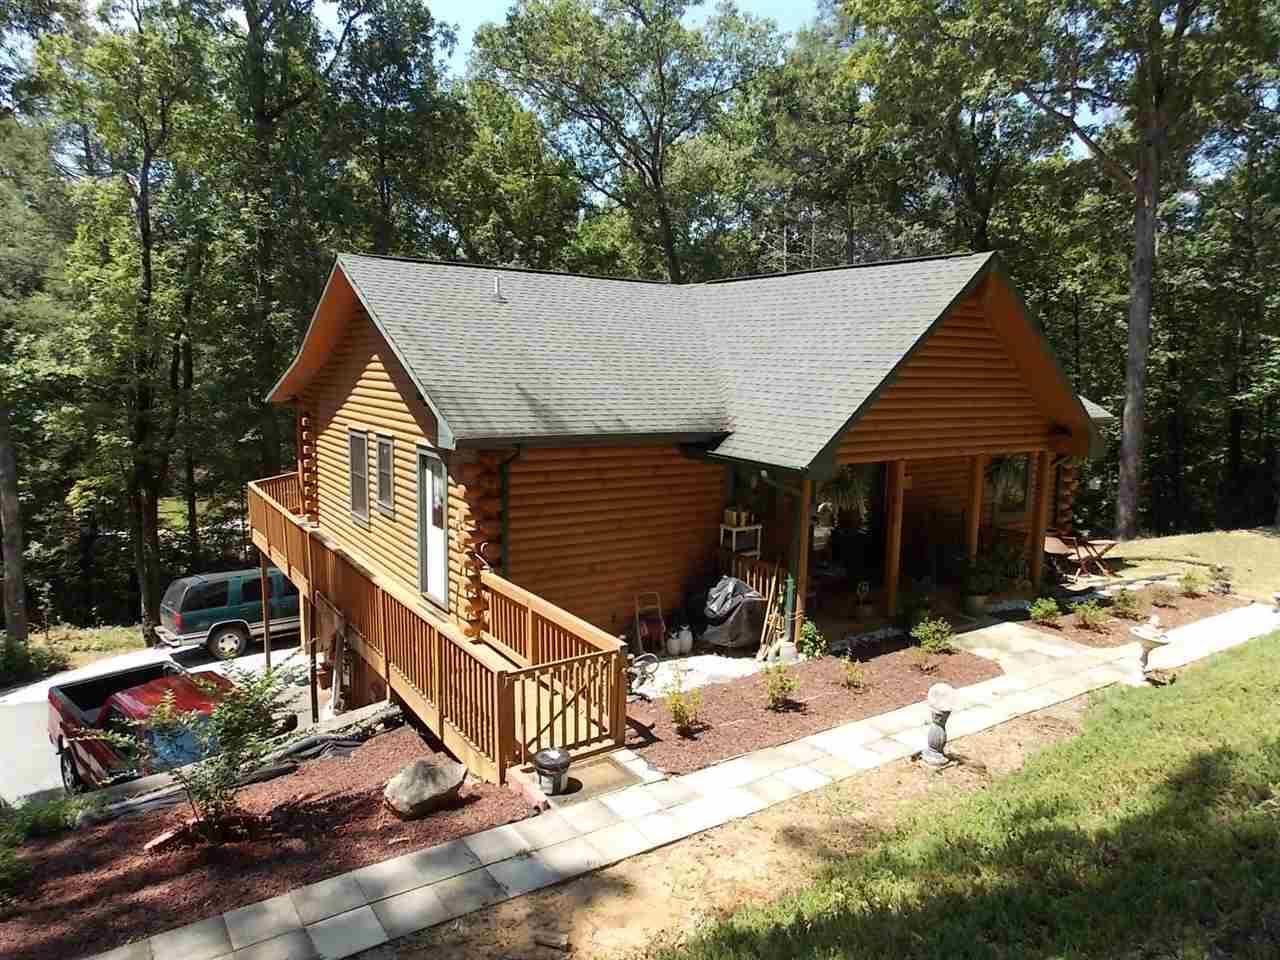 111 Pinnacle Falls Dr, Pickens, SC 29671 (MLS #20168162) :: Les Walden Real Estate